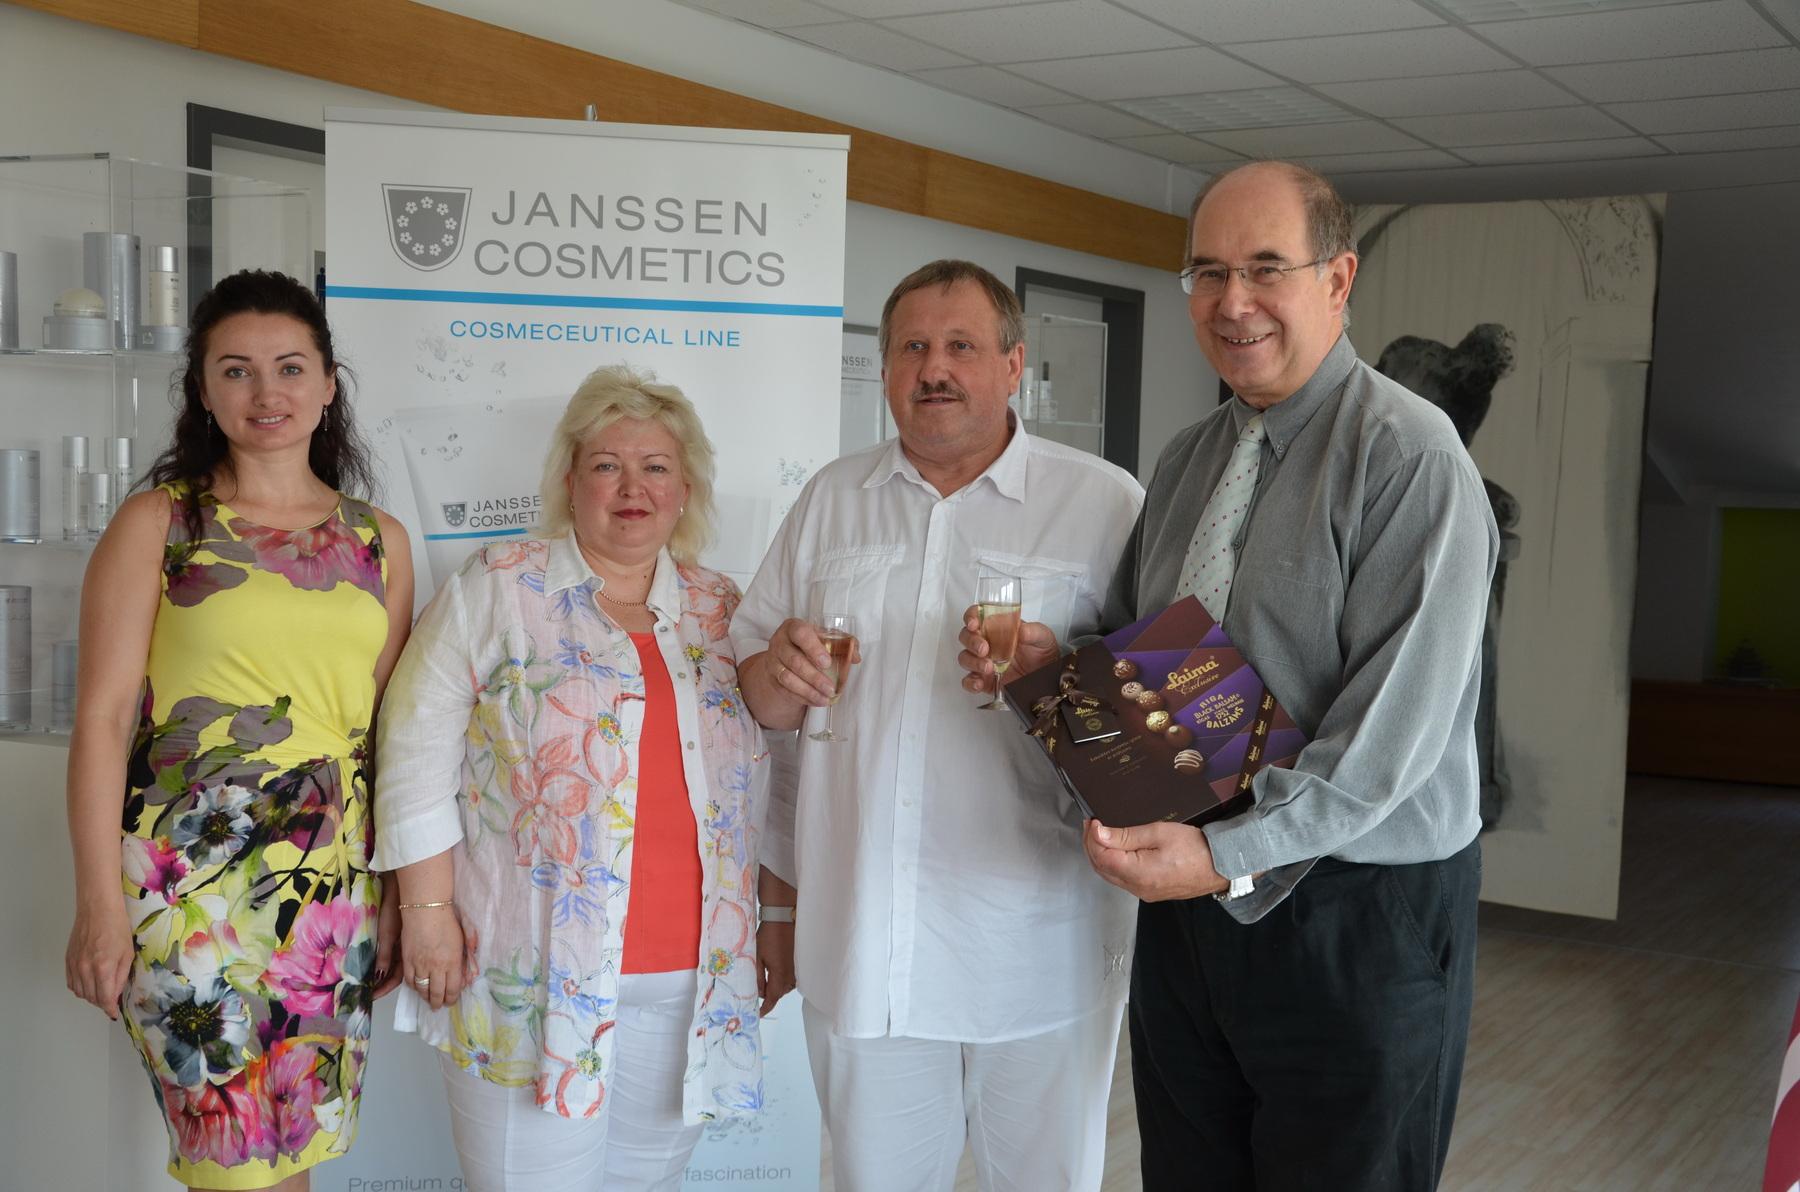 Inese & Rihards in Aachen for seminar